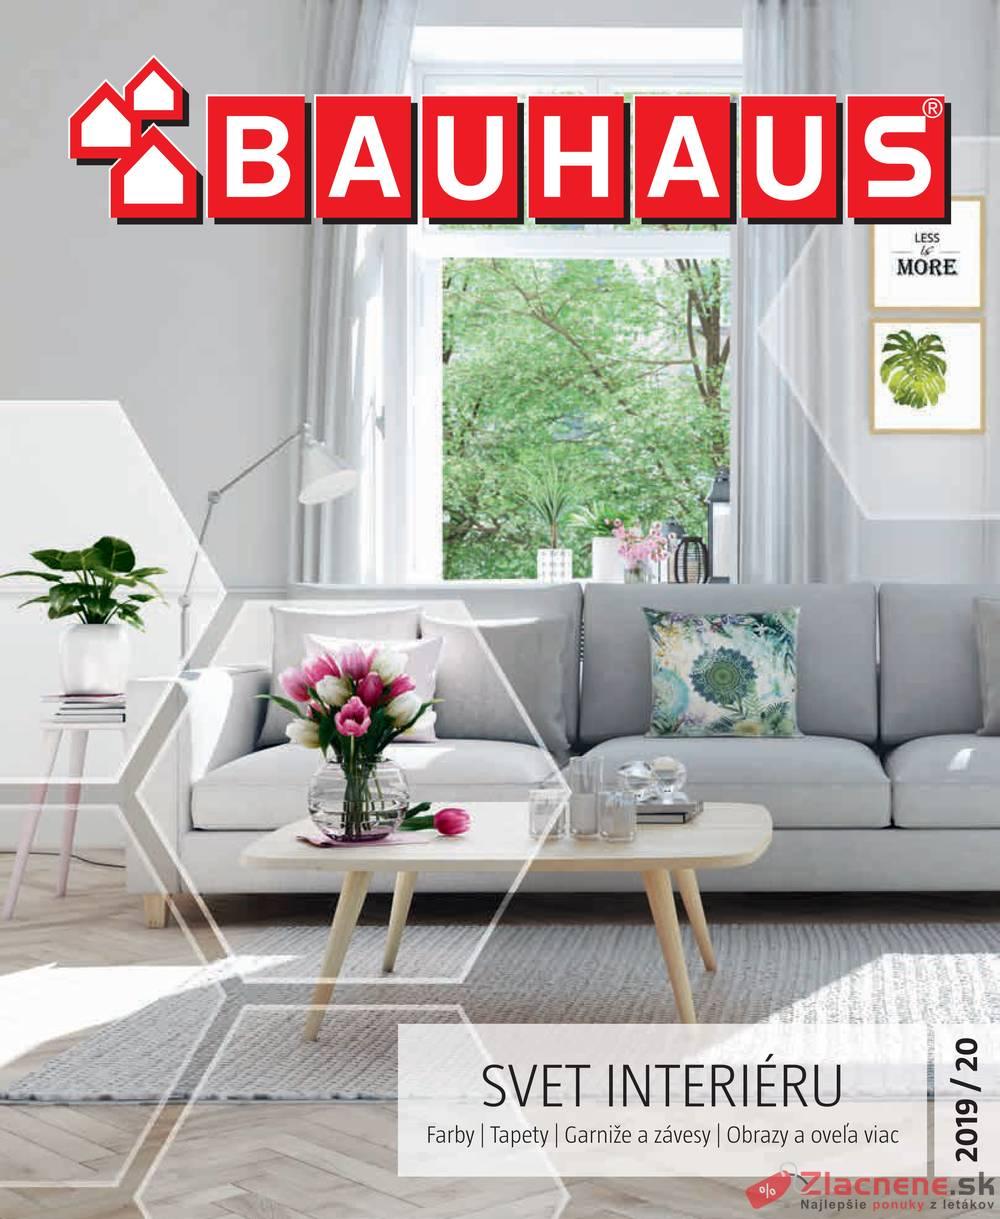 Leták Bauhaus - Bauhaus SVET INTERIÉRU od 9.9. do 29.2.2020 - strana 1